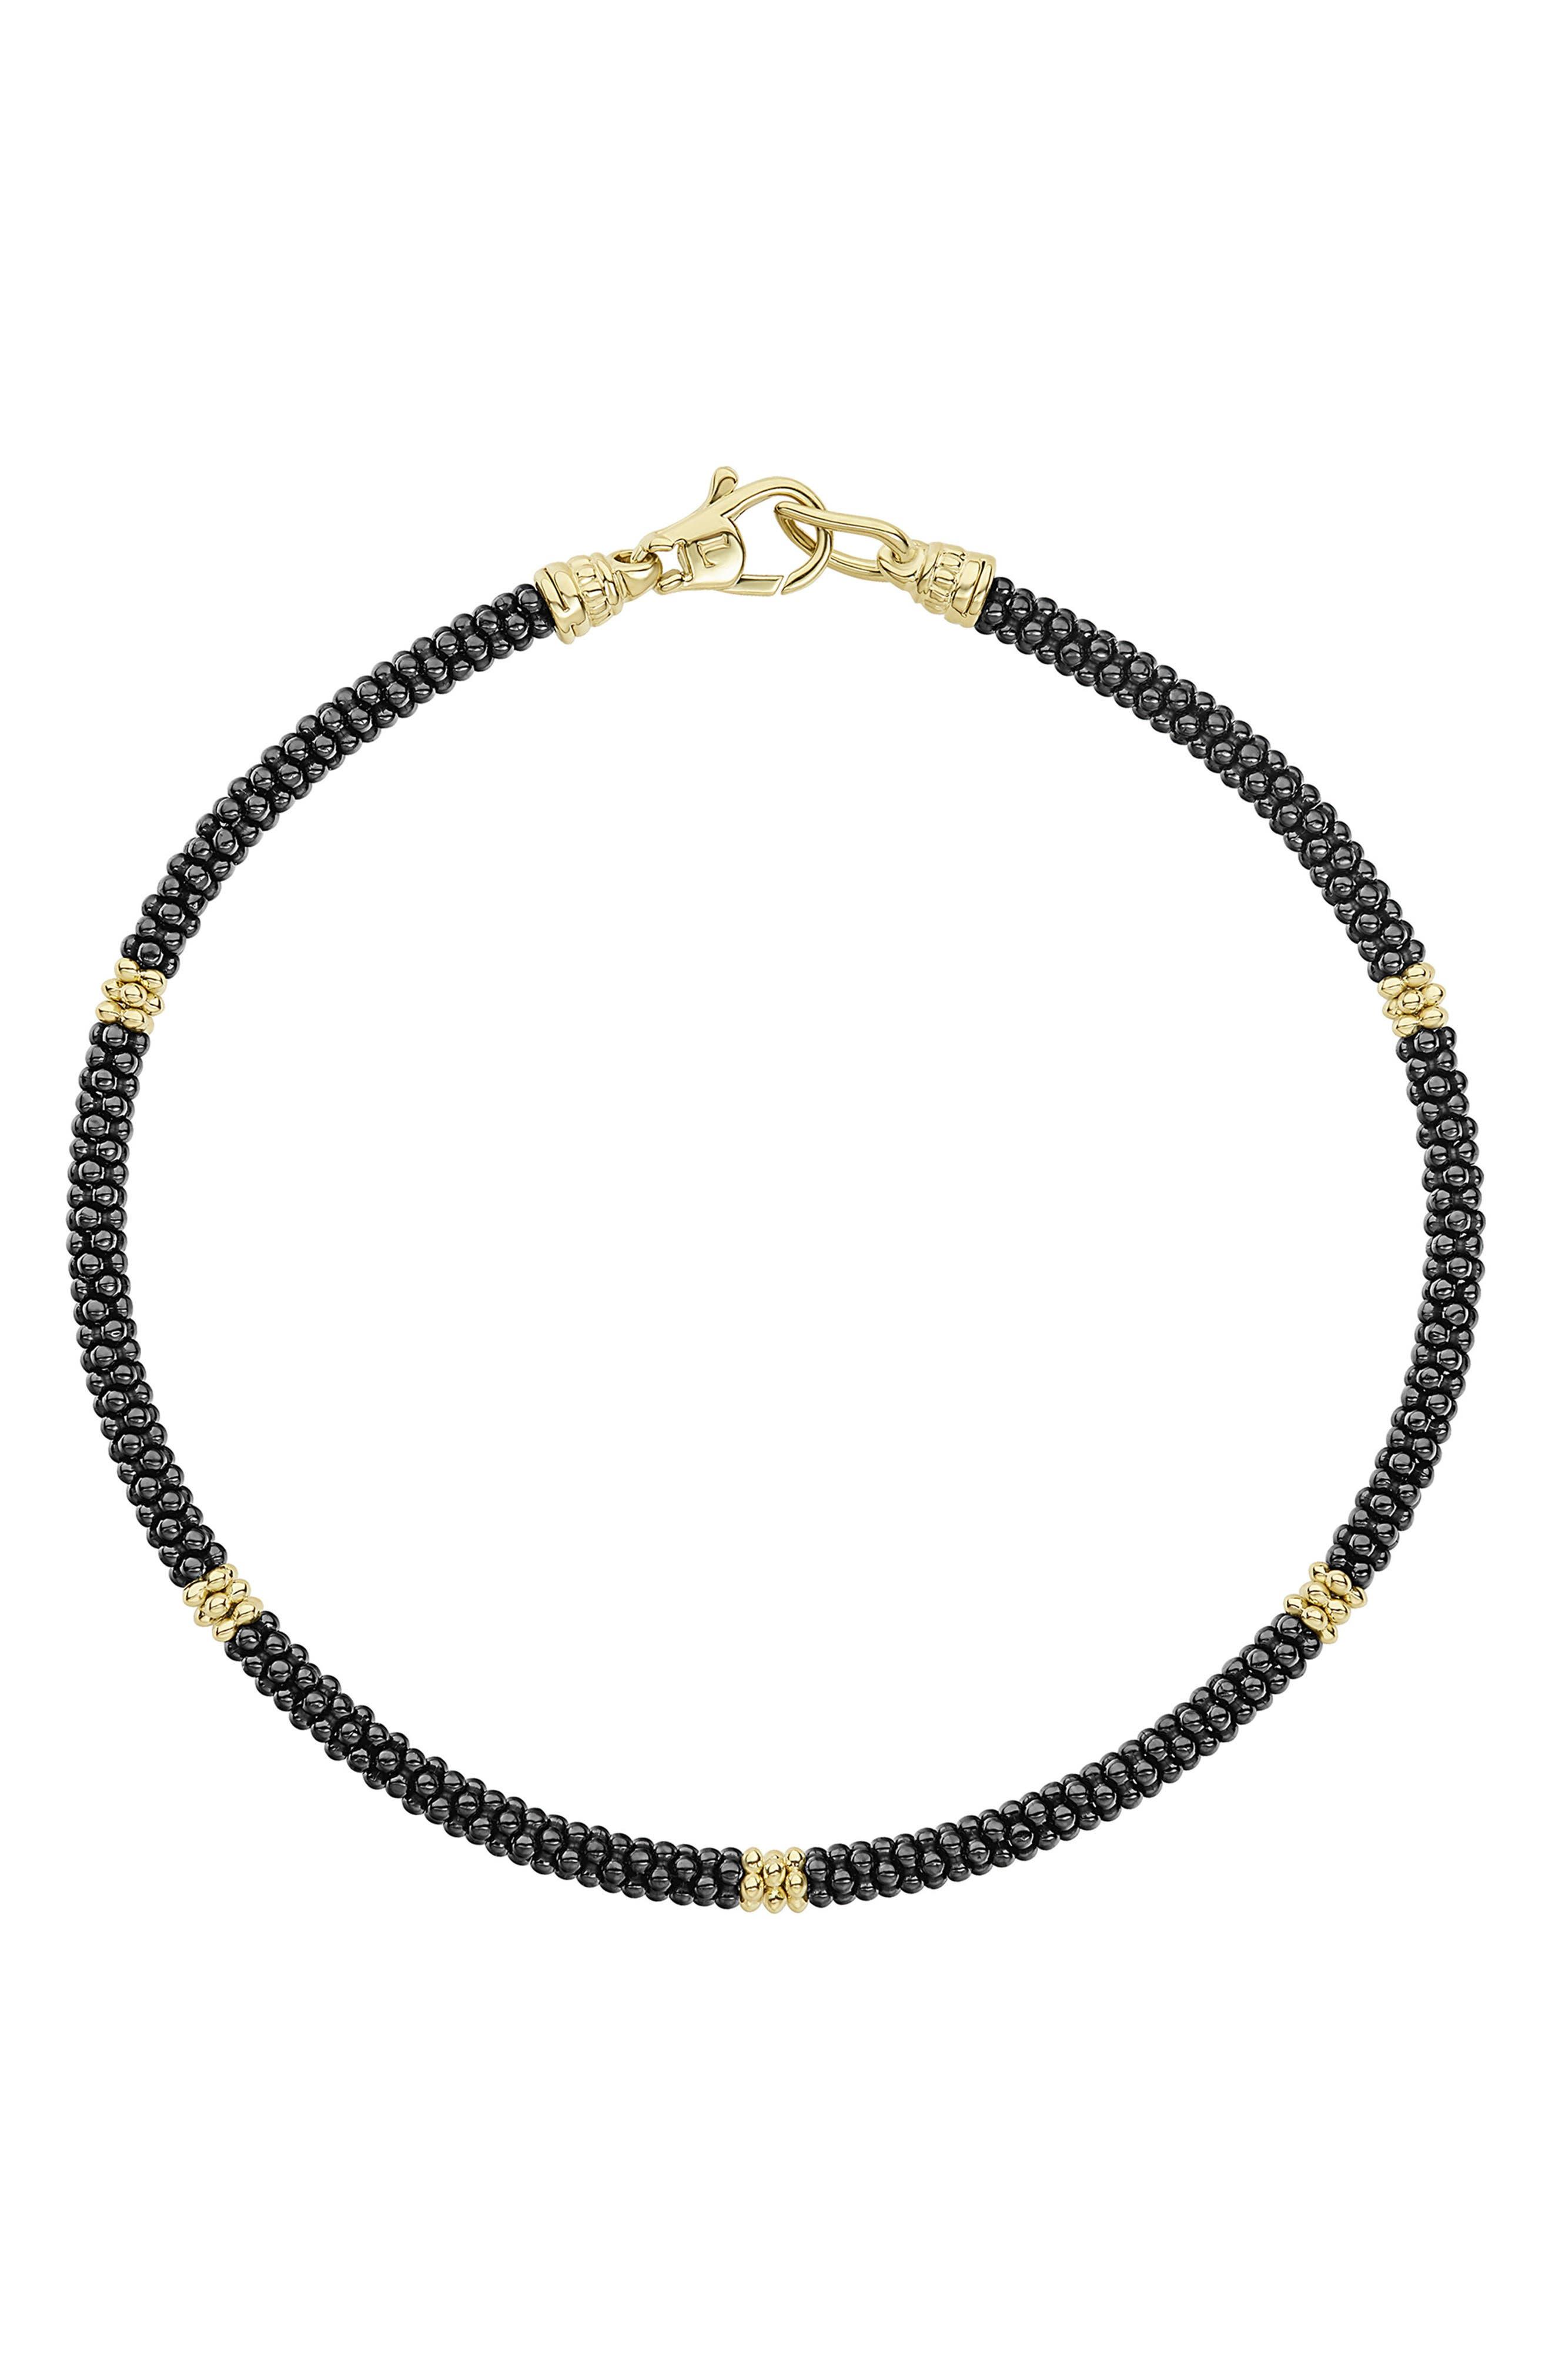 Gold & Black Caviar Rope Bracelet,                             Main thumbnail 1, color,                             Gold